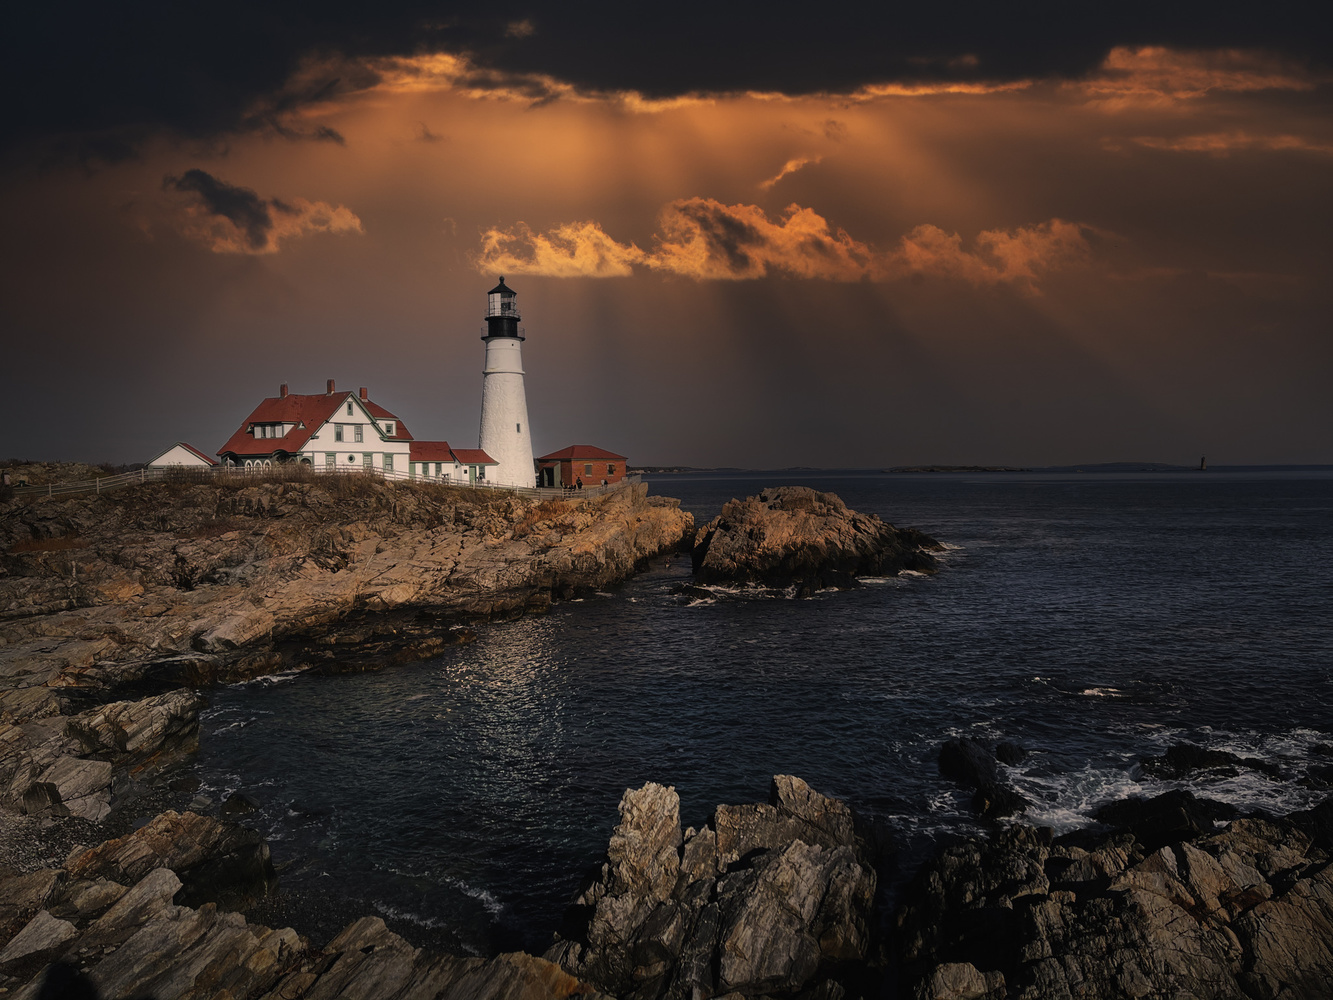 Portland lighthouse by Skyler Ewing